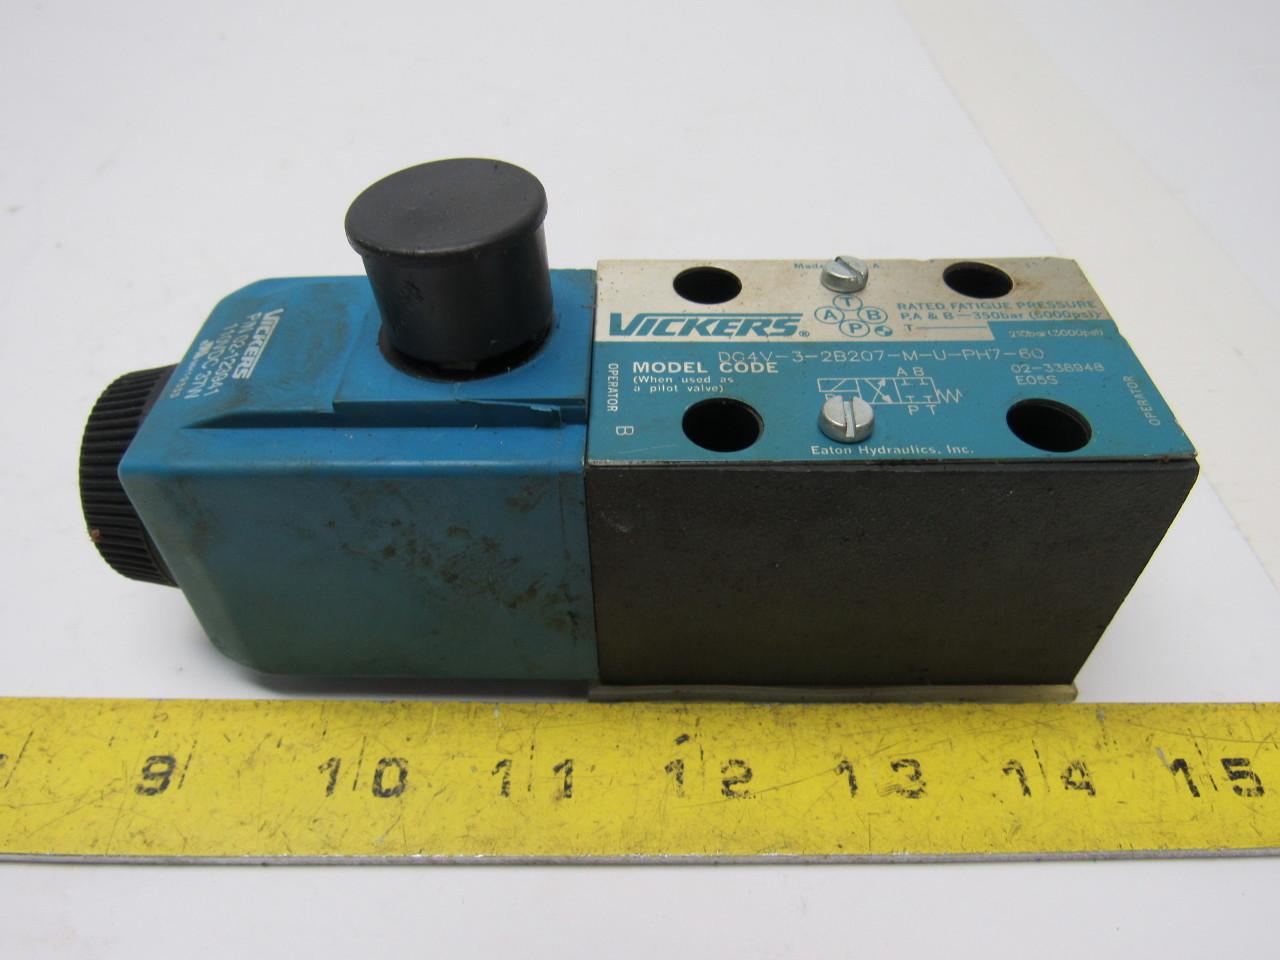 Vickers DG4V-3-2B207-M-U-PH7-60 Hydraulic Solenoid Valve W/110VDC Coil